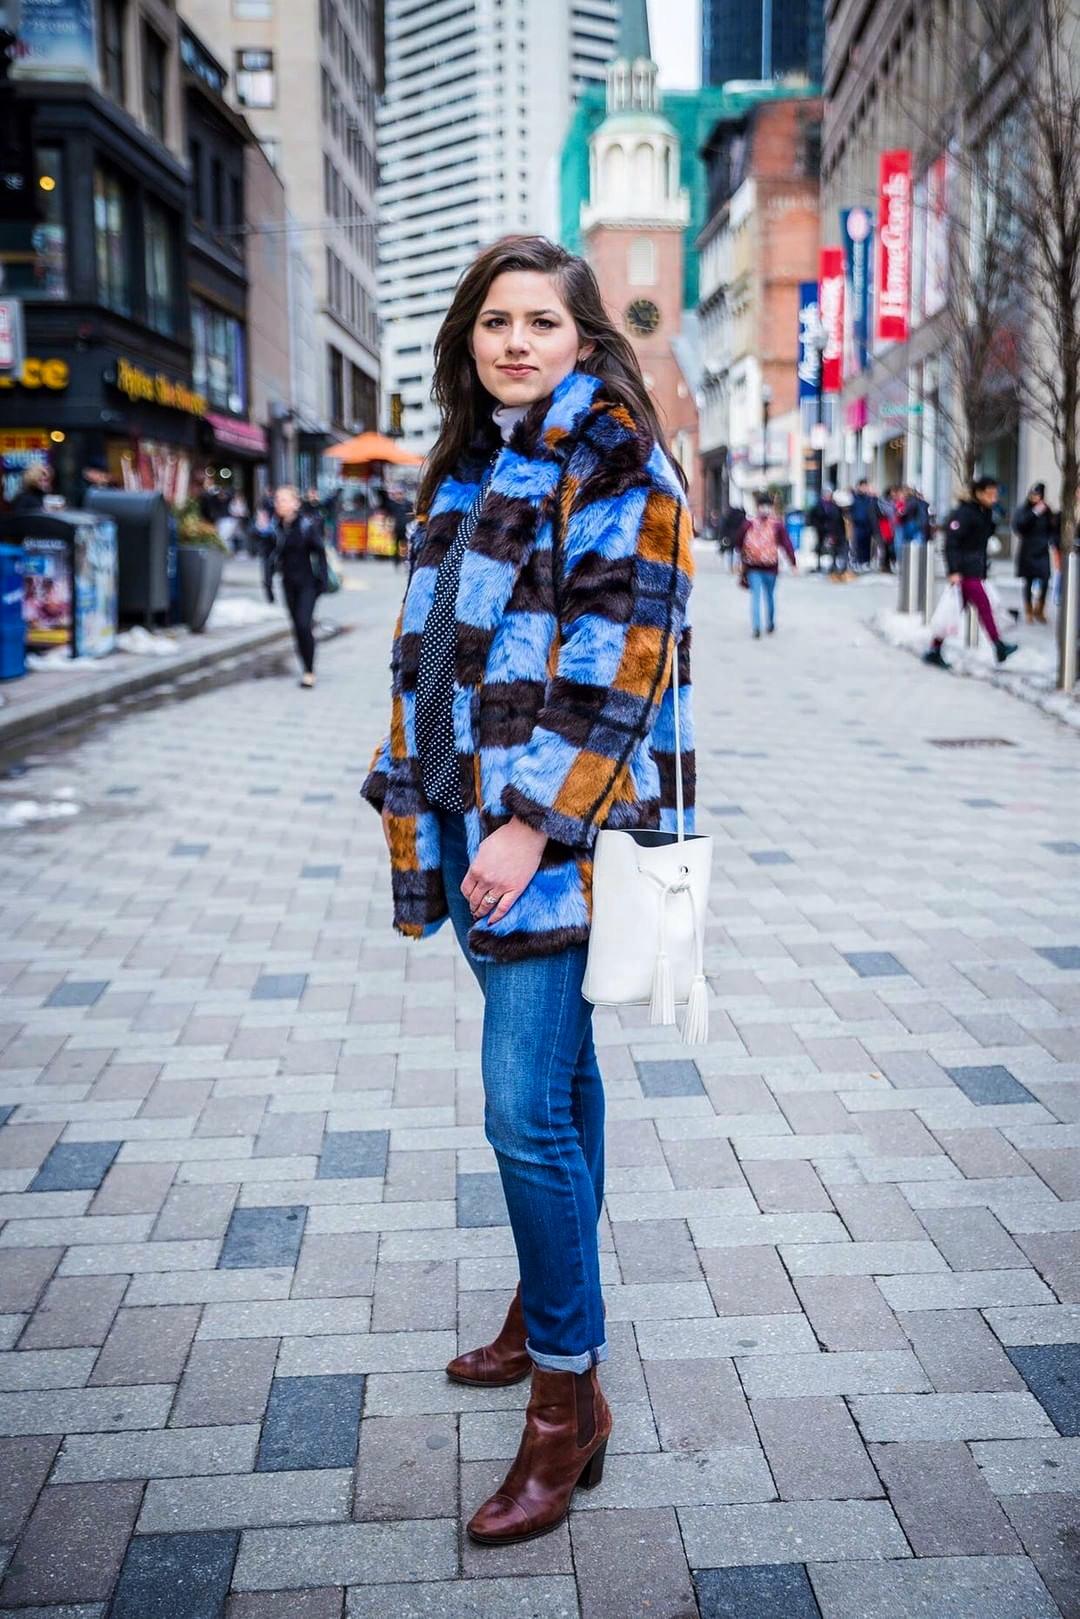 Coat:    Monki via ASOS     Top: Michael Kors (out stock), similar    here    and    here     Jeans:    Madewell     Shoes: Saks Off Fifth (out of stock), similar    here   ,    here   , and    here     Bag: Forever 21 (out of stock), similar    here     Photographer: @salma_kil